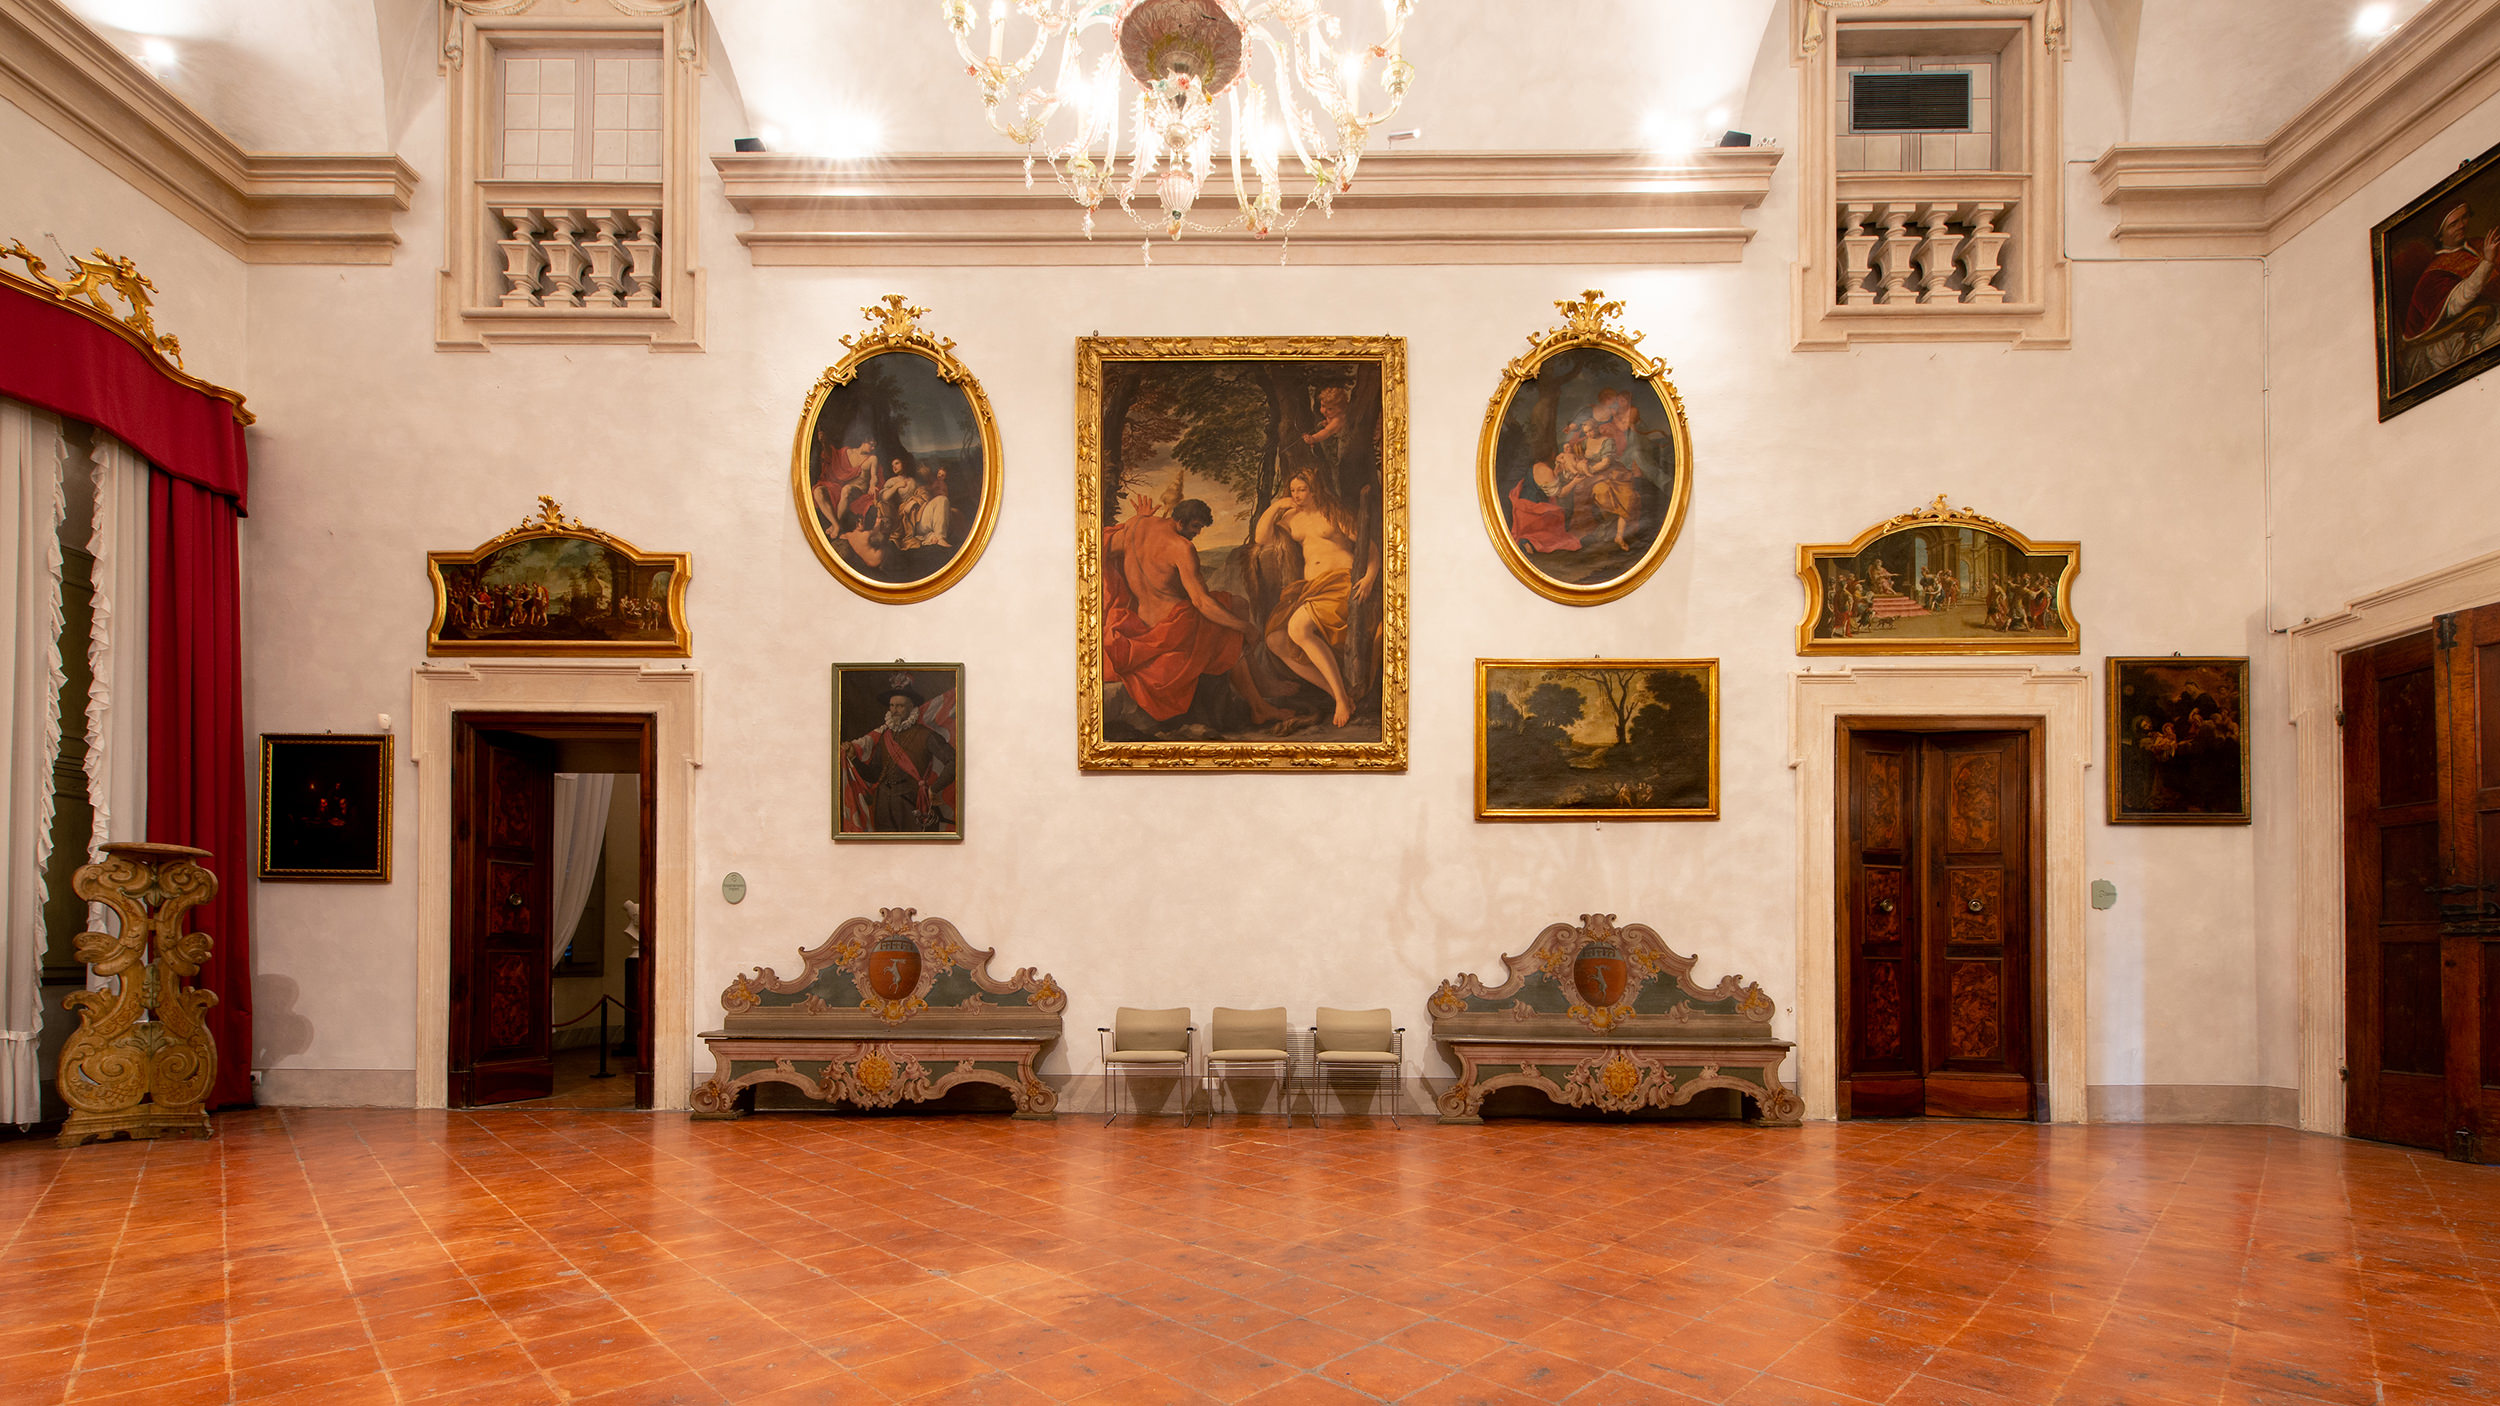 Palazzo_Tozzoni_180802_006.jpg